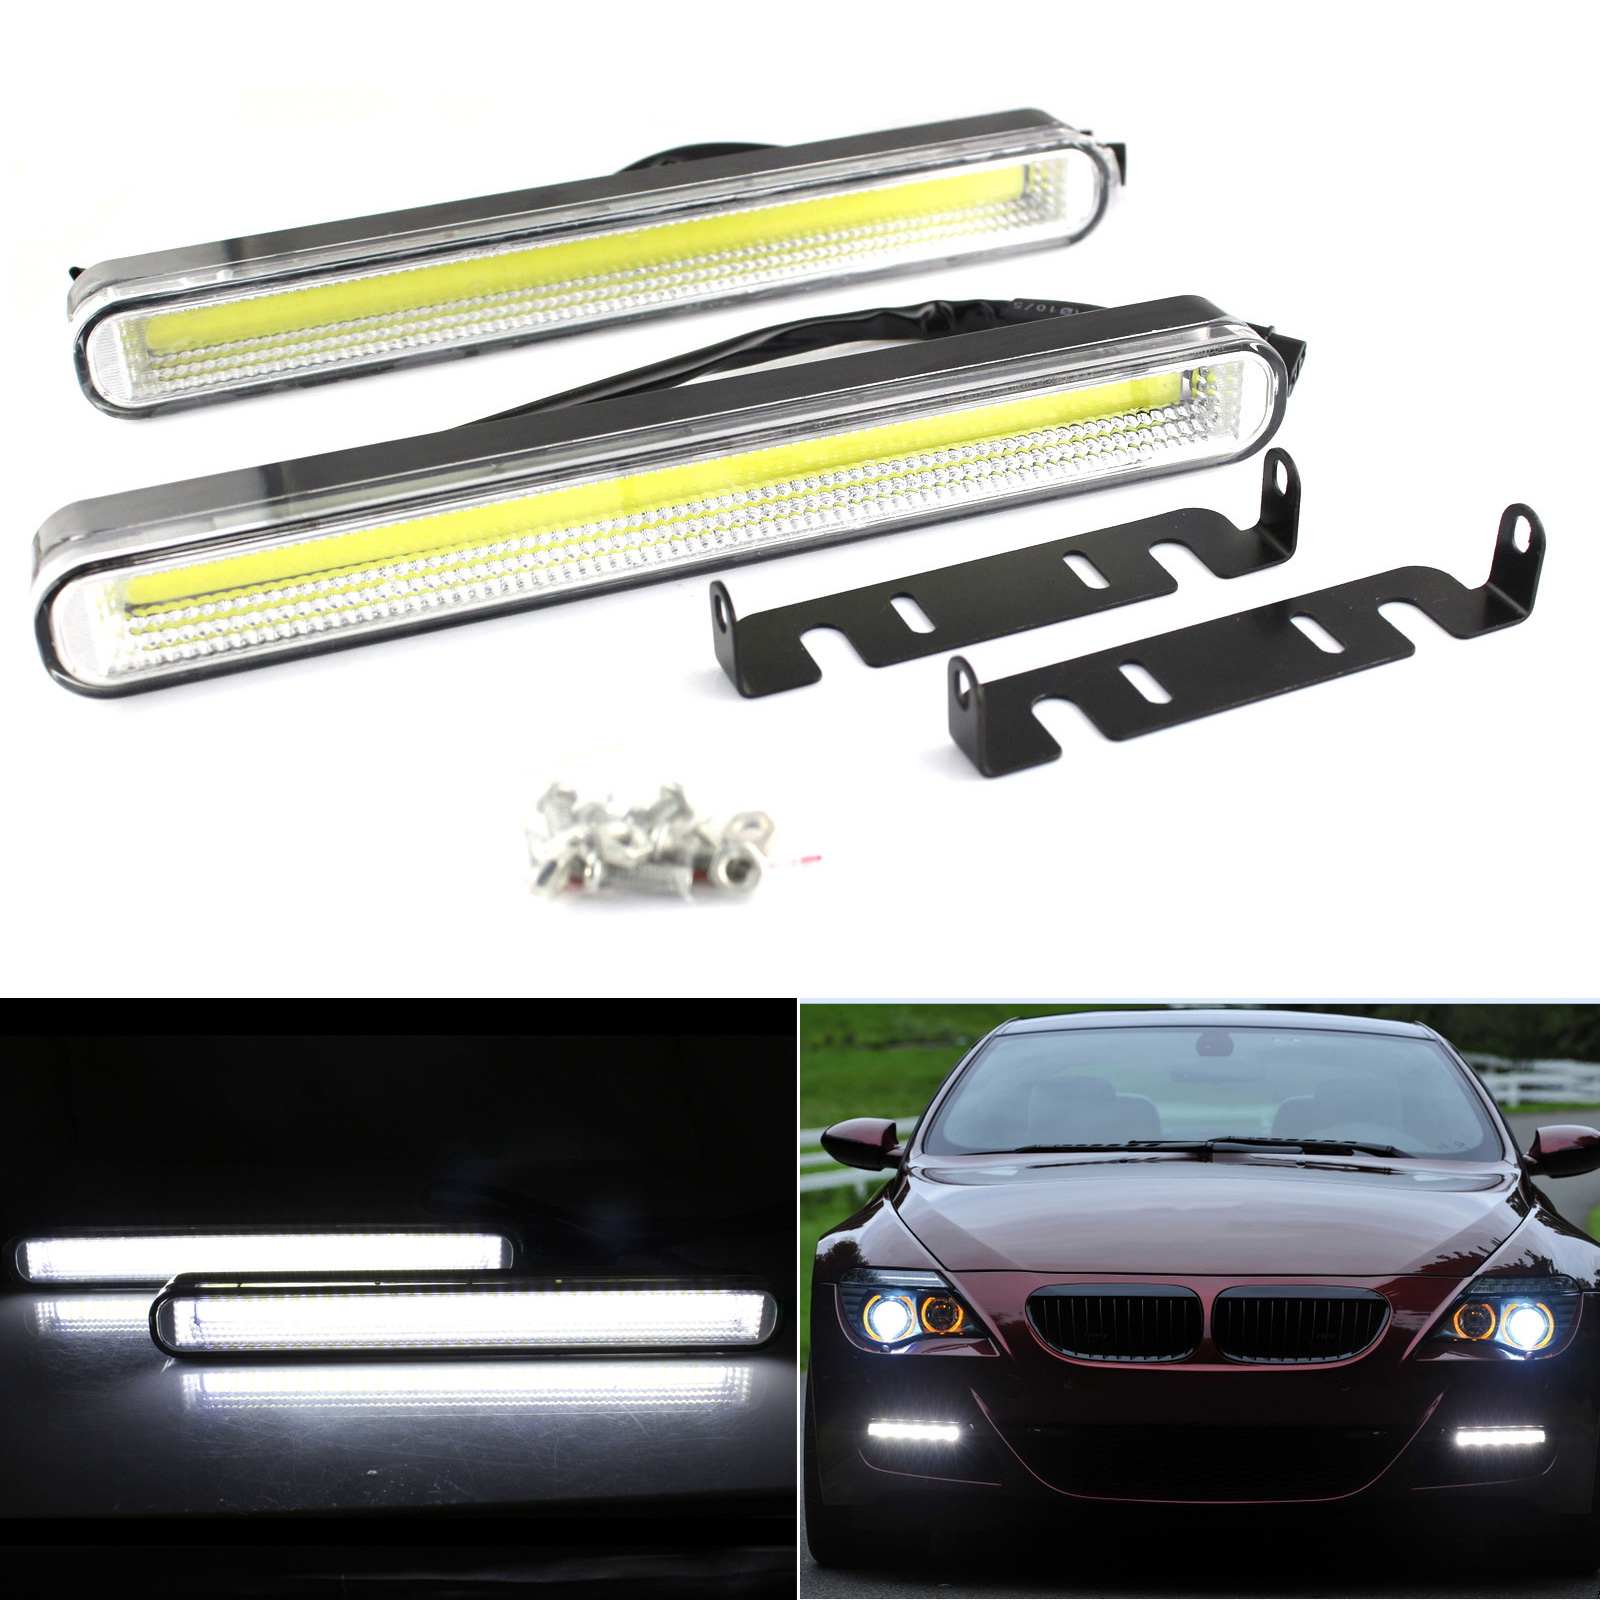 2PCS Car COB 99 LED Car Auto DRL Daytime Running Light Source Fog Lamp Bulb 1500LM 6000K White DC12V